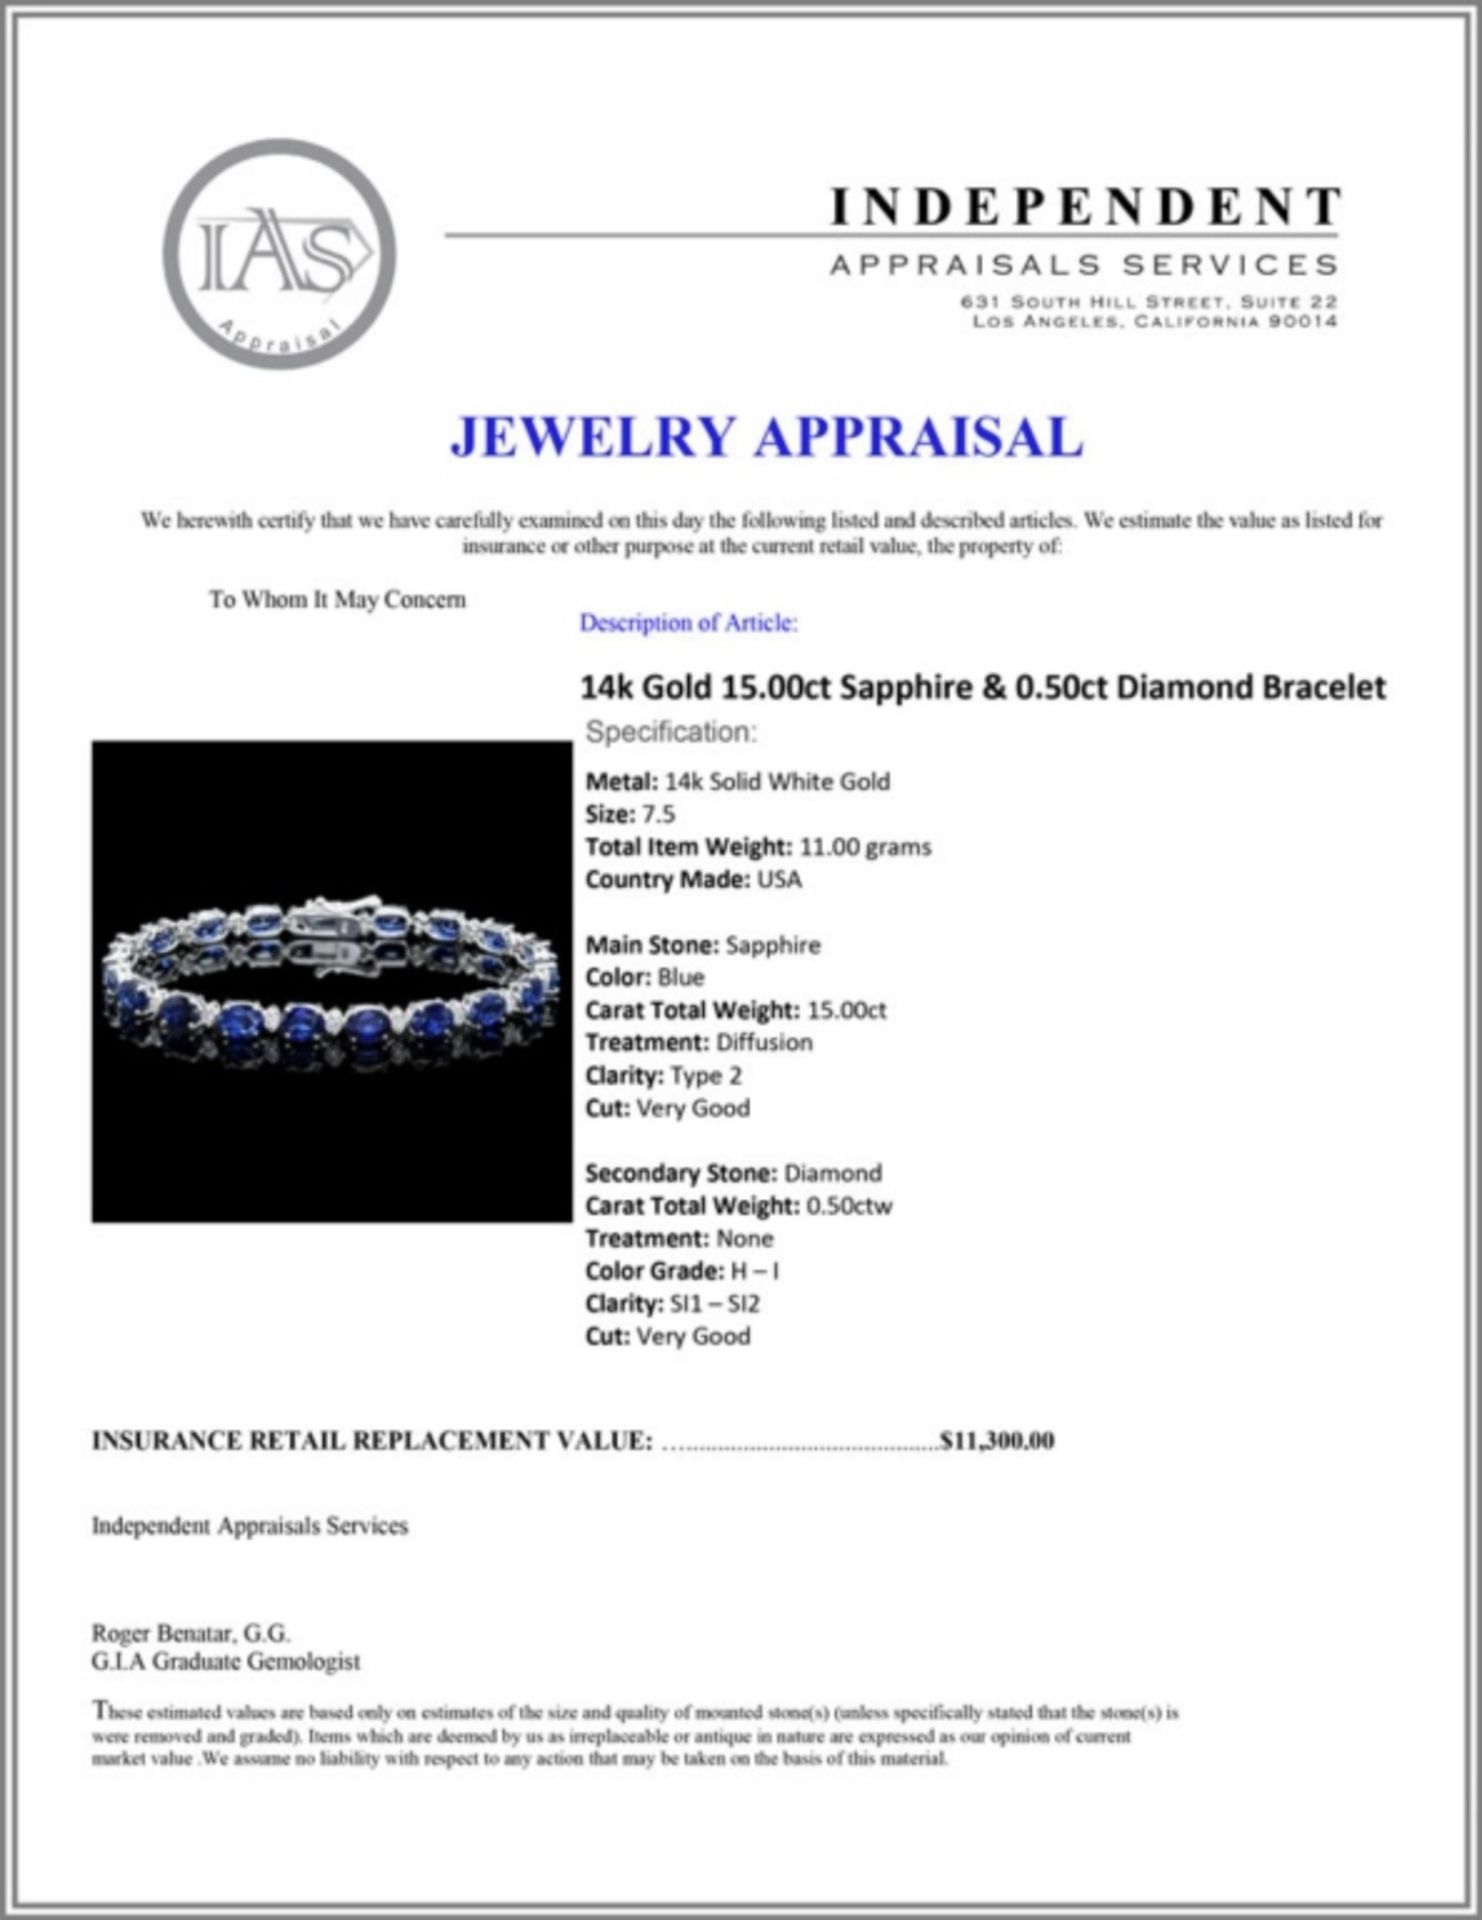 `14k Gold 15.00ct Sapphire & 0.50ct Diamond Bracel - Image 3 of 3